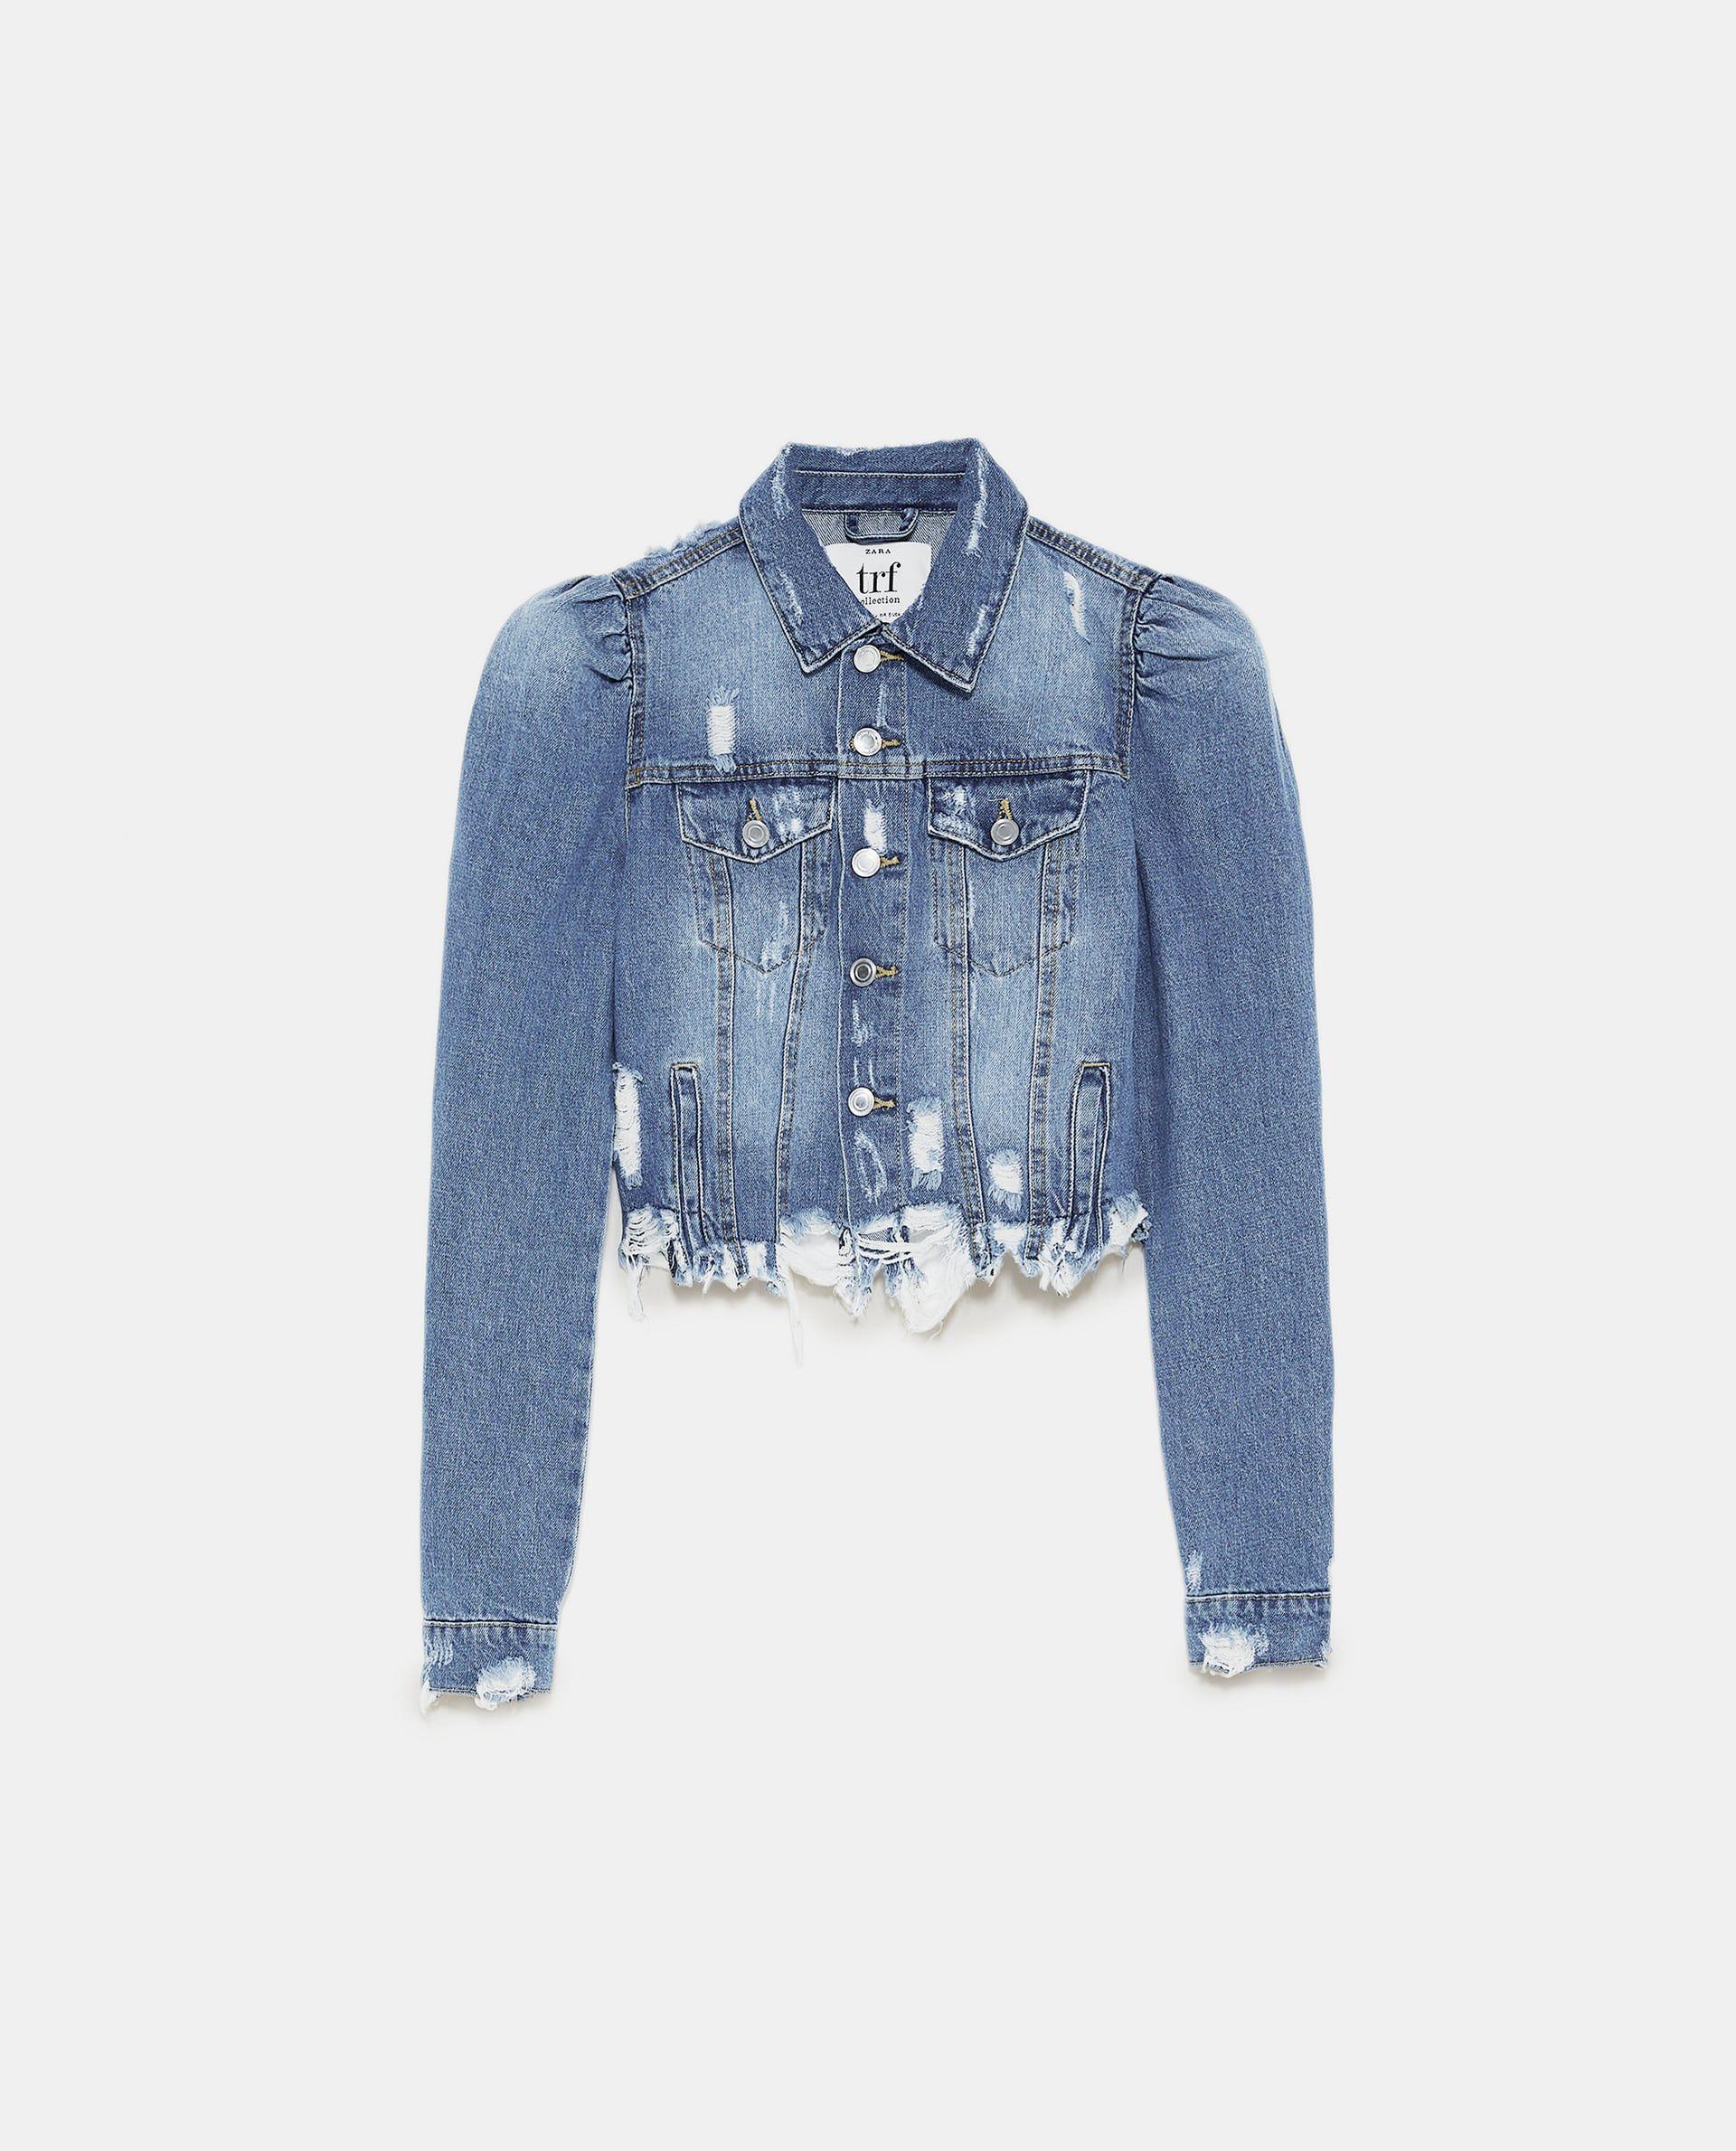 #PopbelaOOTD: Fashion Item Dibawah Sejuta yang Terlihat Mewah